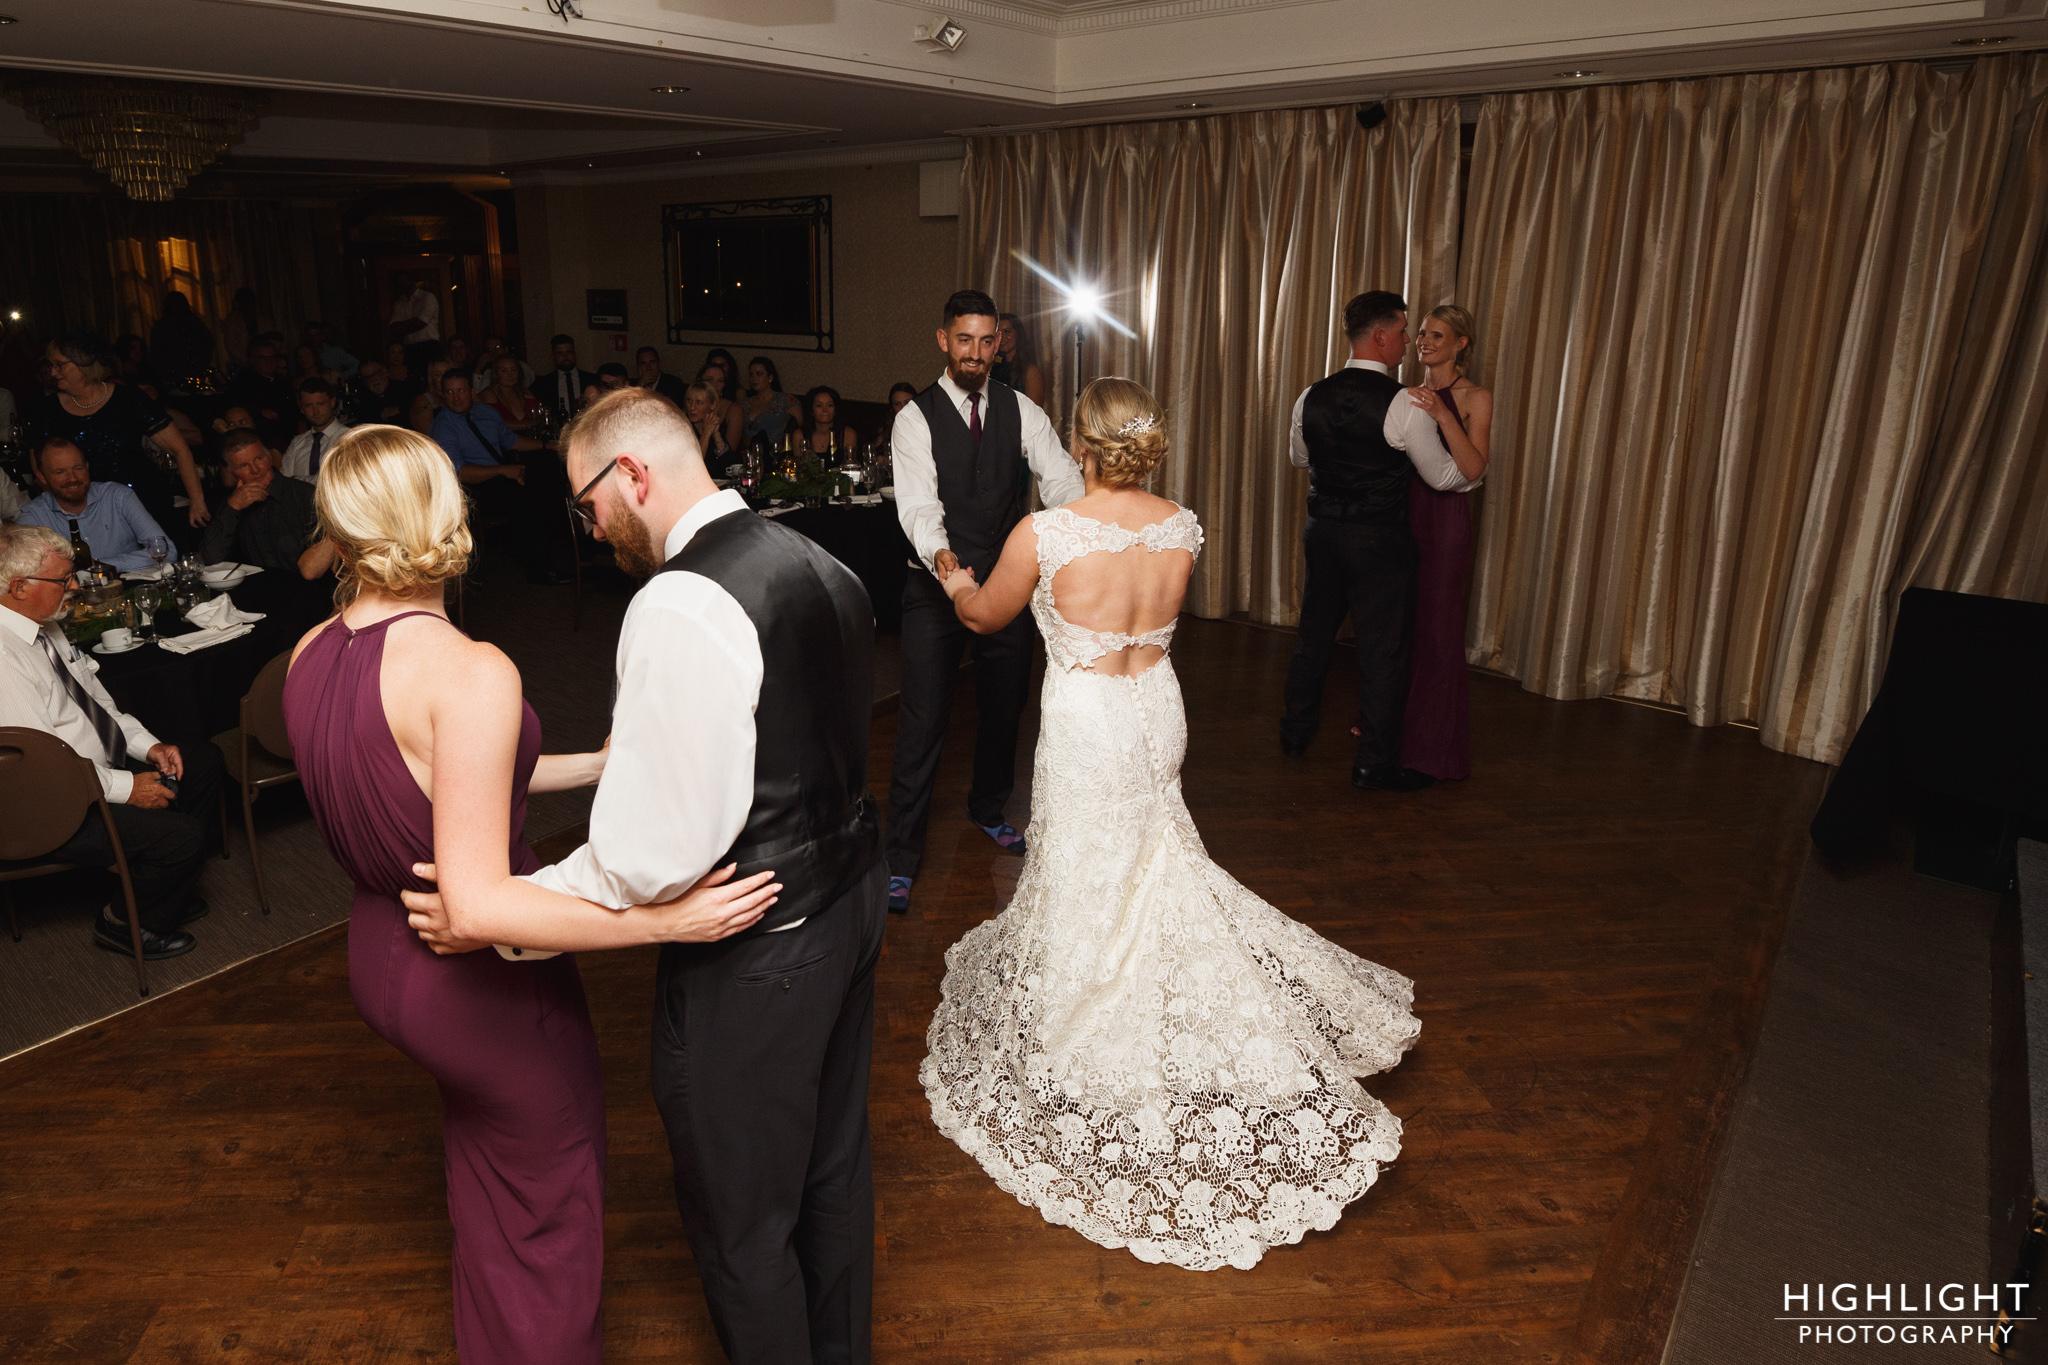 highlight-wedding-photography-feilding-new-zealand-209.jpg